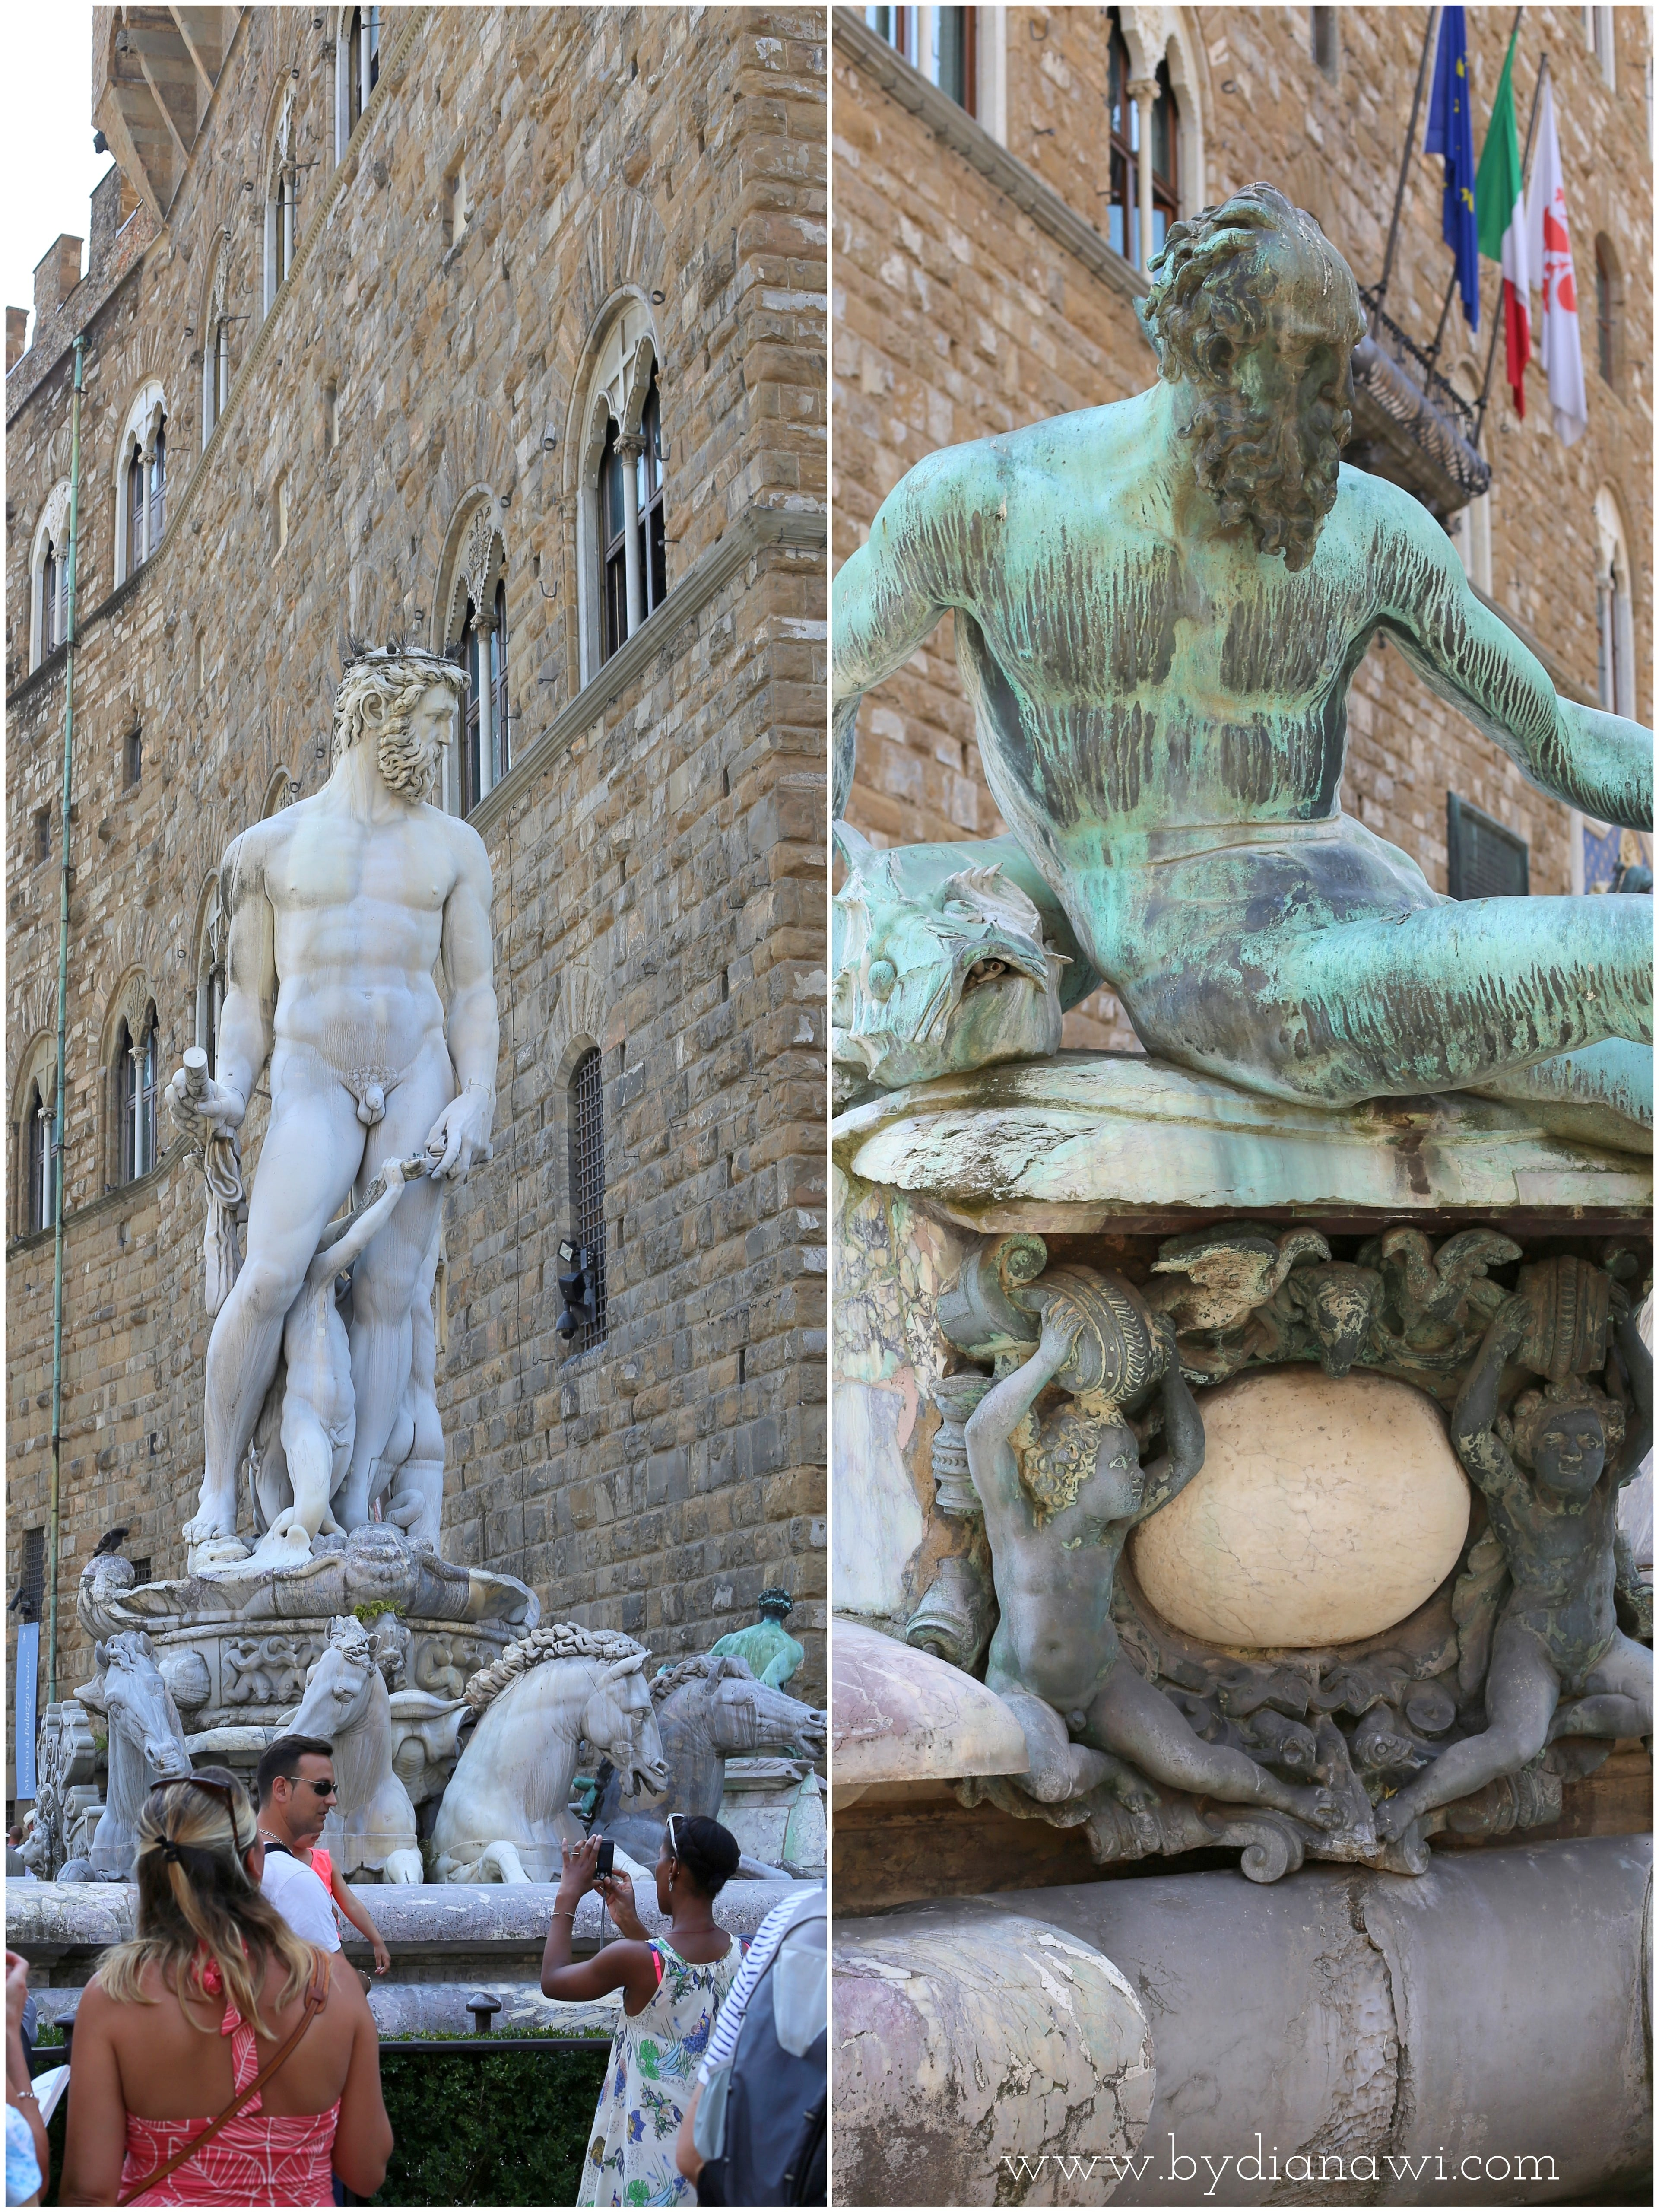 Piazza Della Signoria, Neptun-fontænen, Firenze